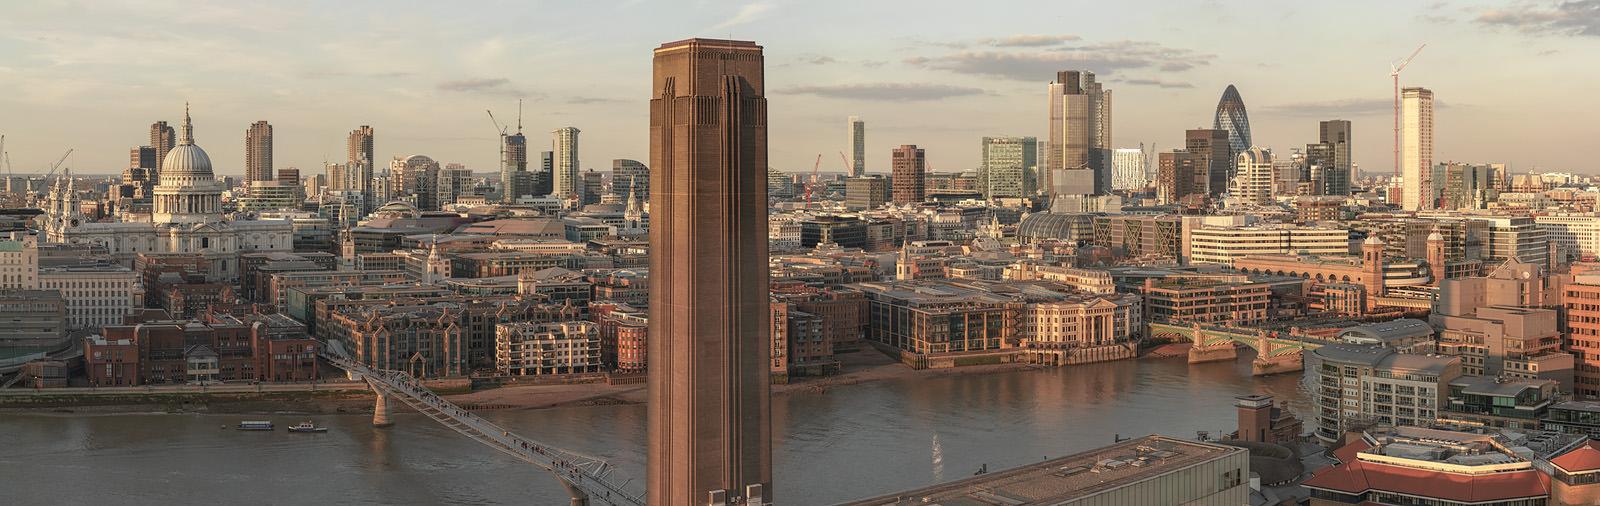 London Stilled Acrylic - High-Resolution London Fine Art Photographic Print